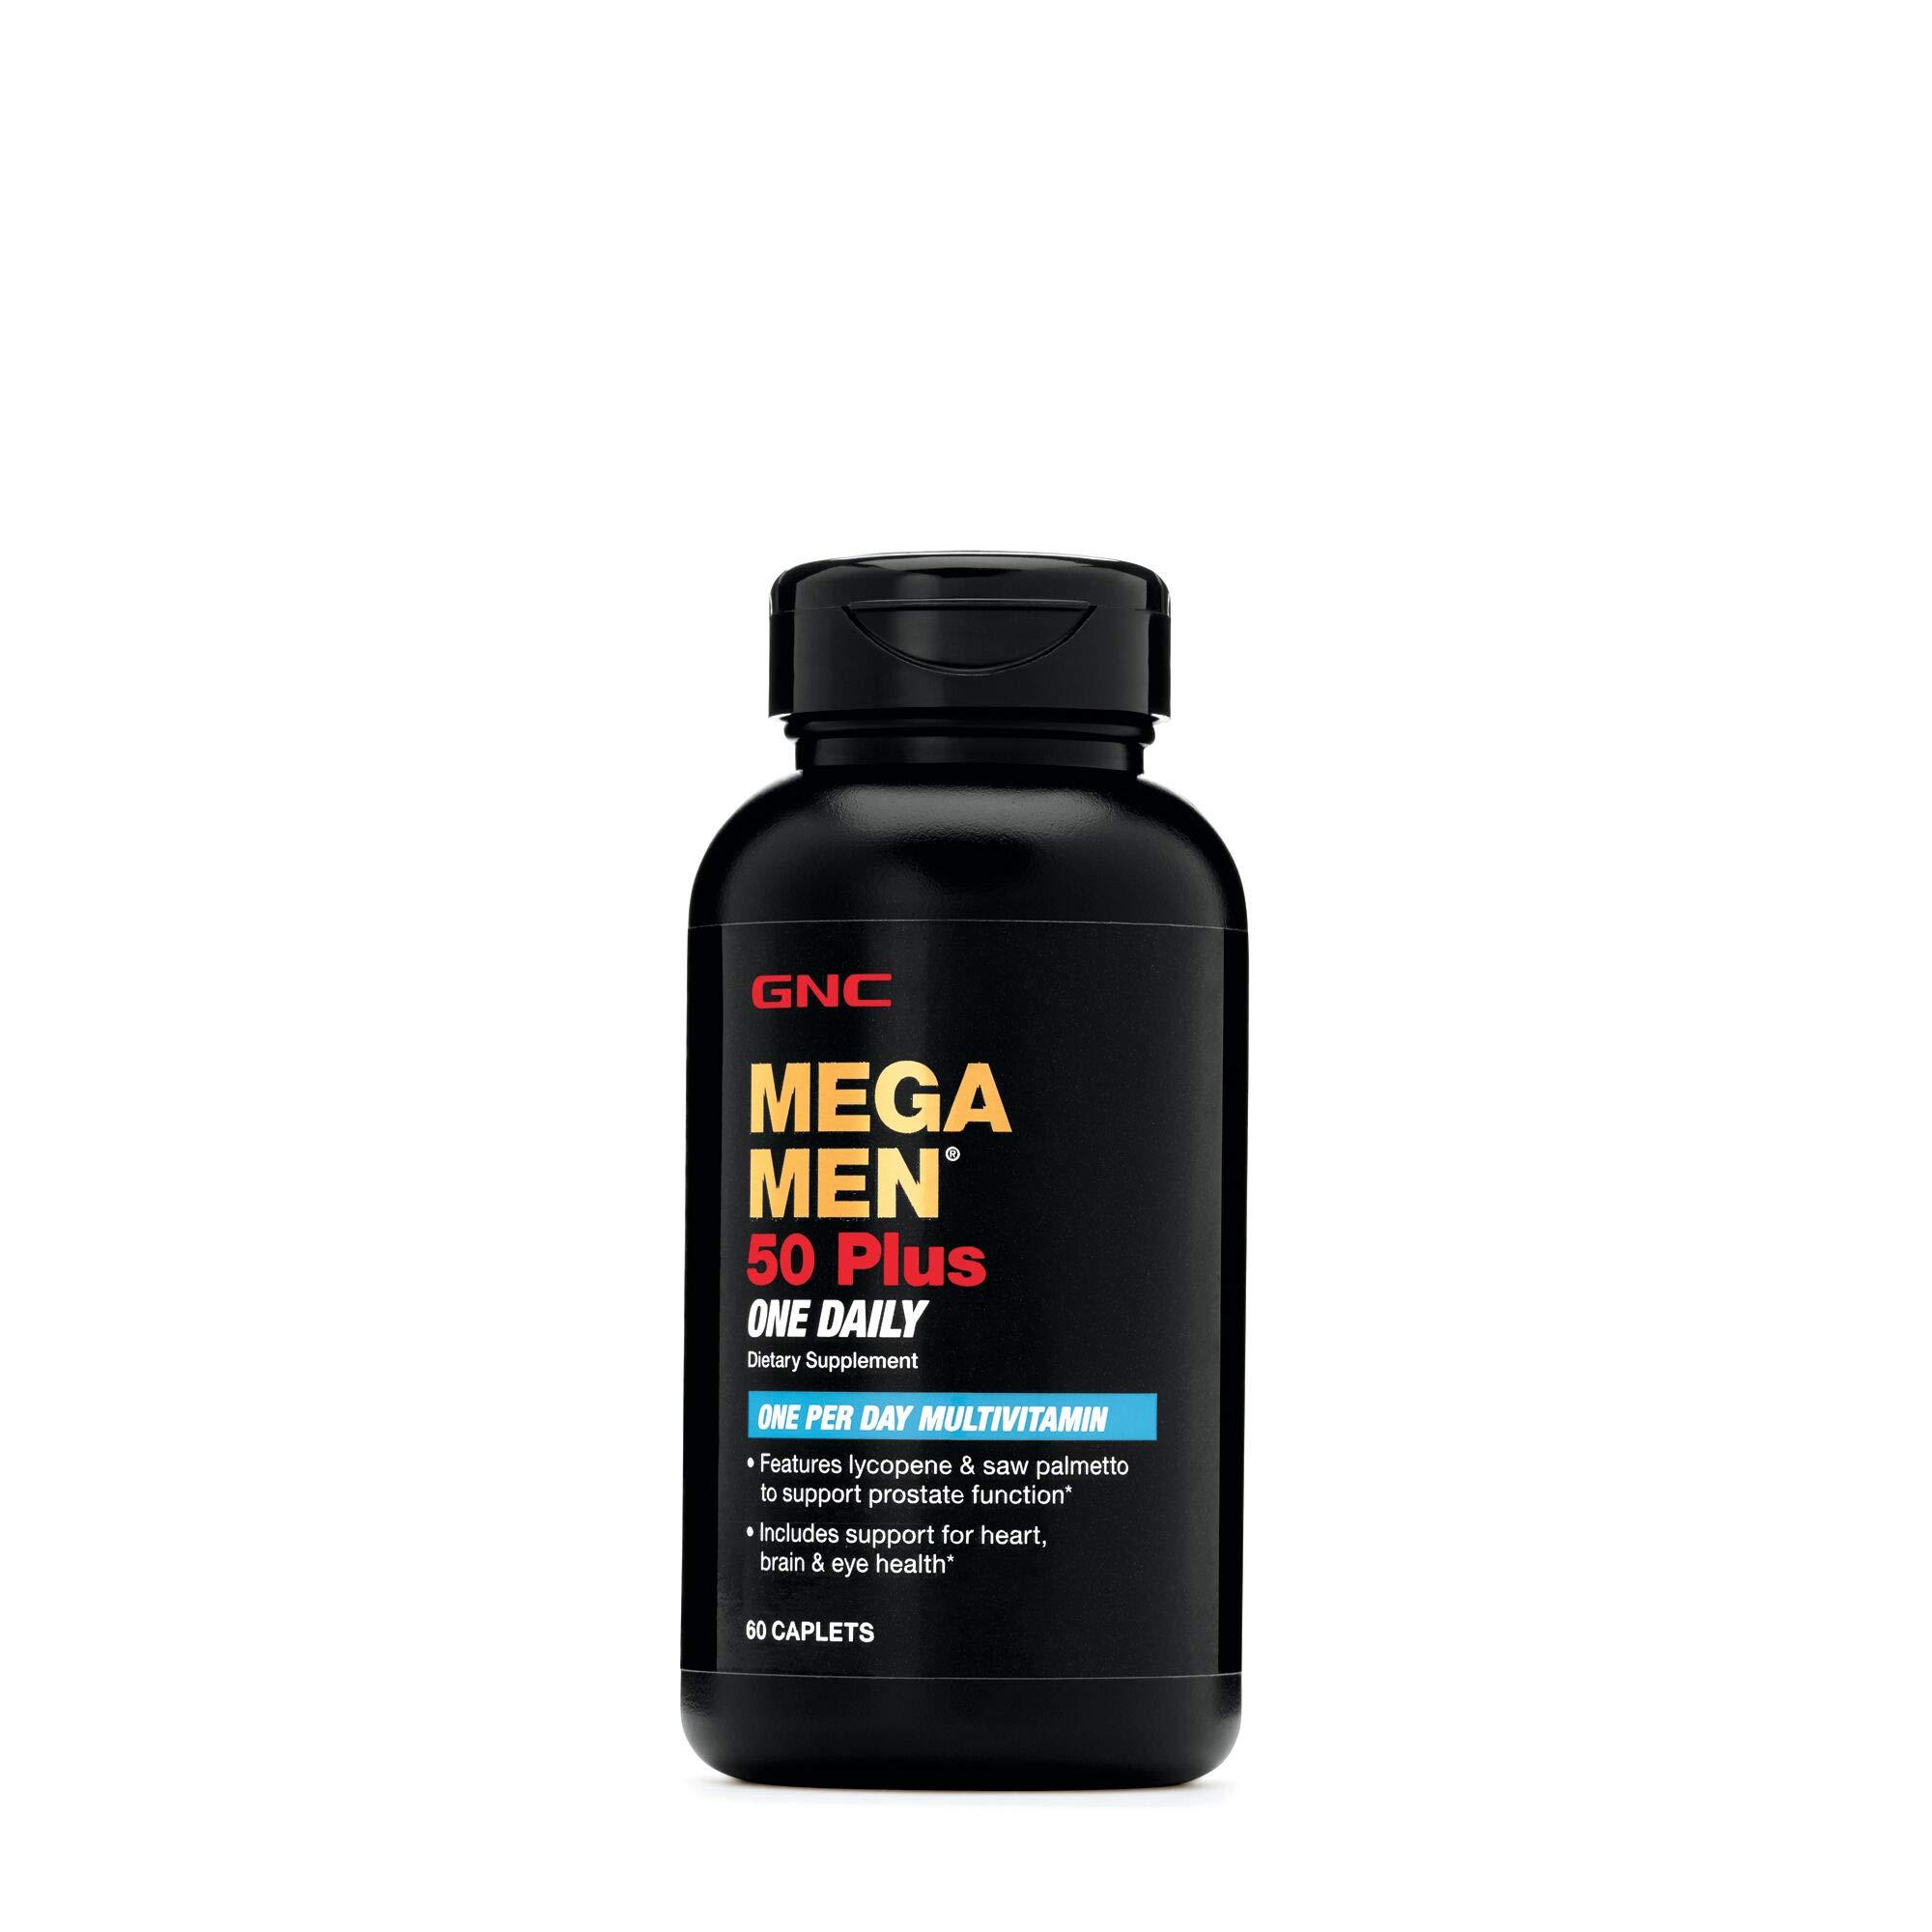 GNC Mega Men 50 Plus One Daily - 60 Caplets